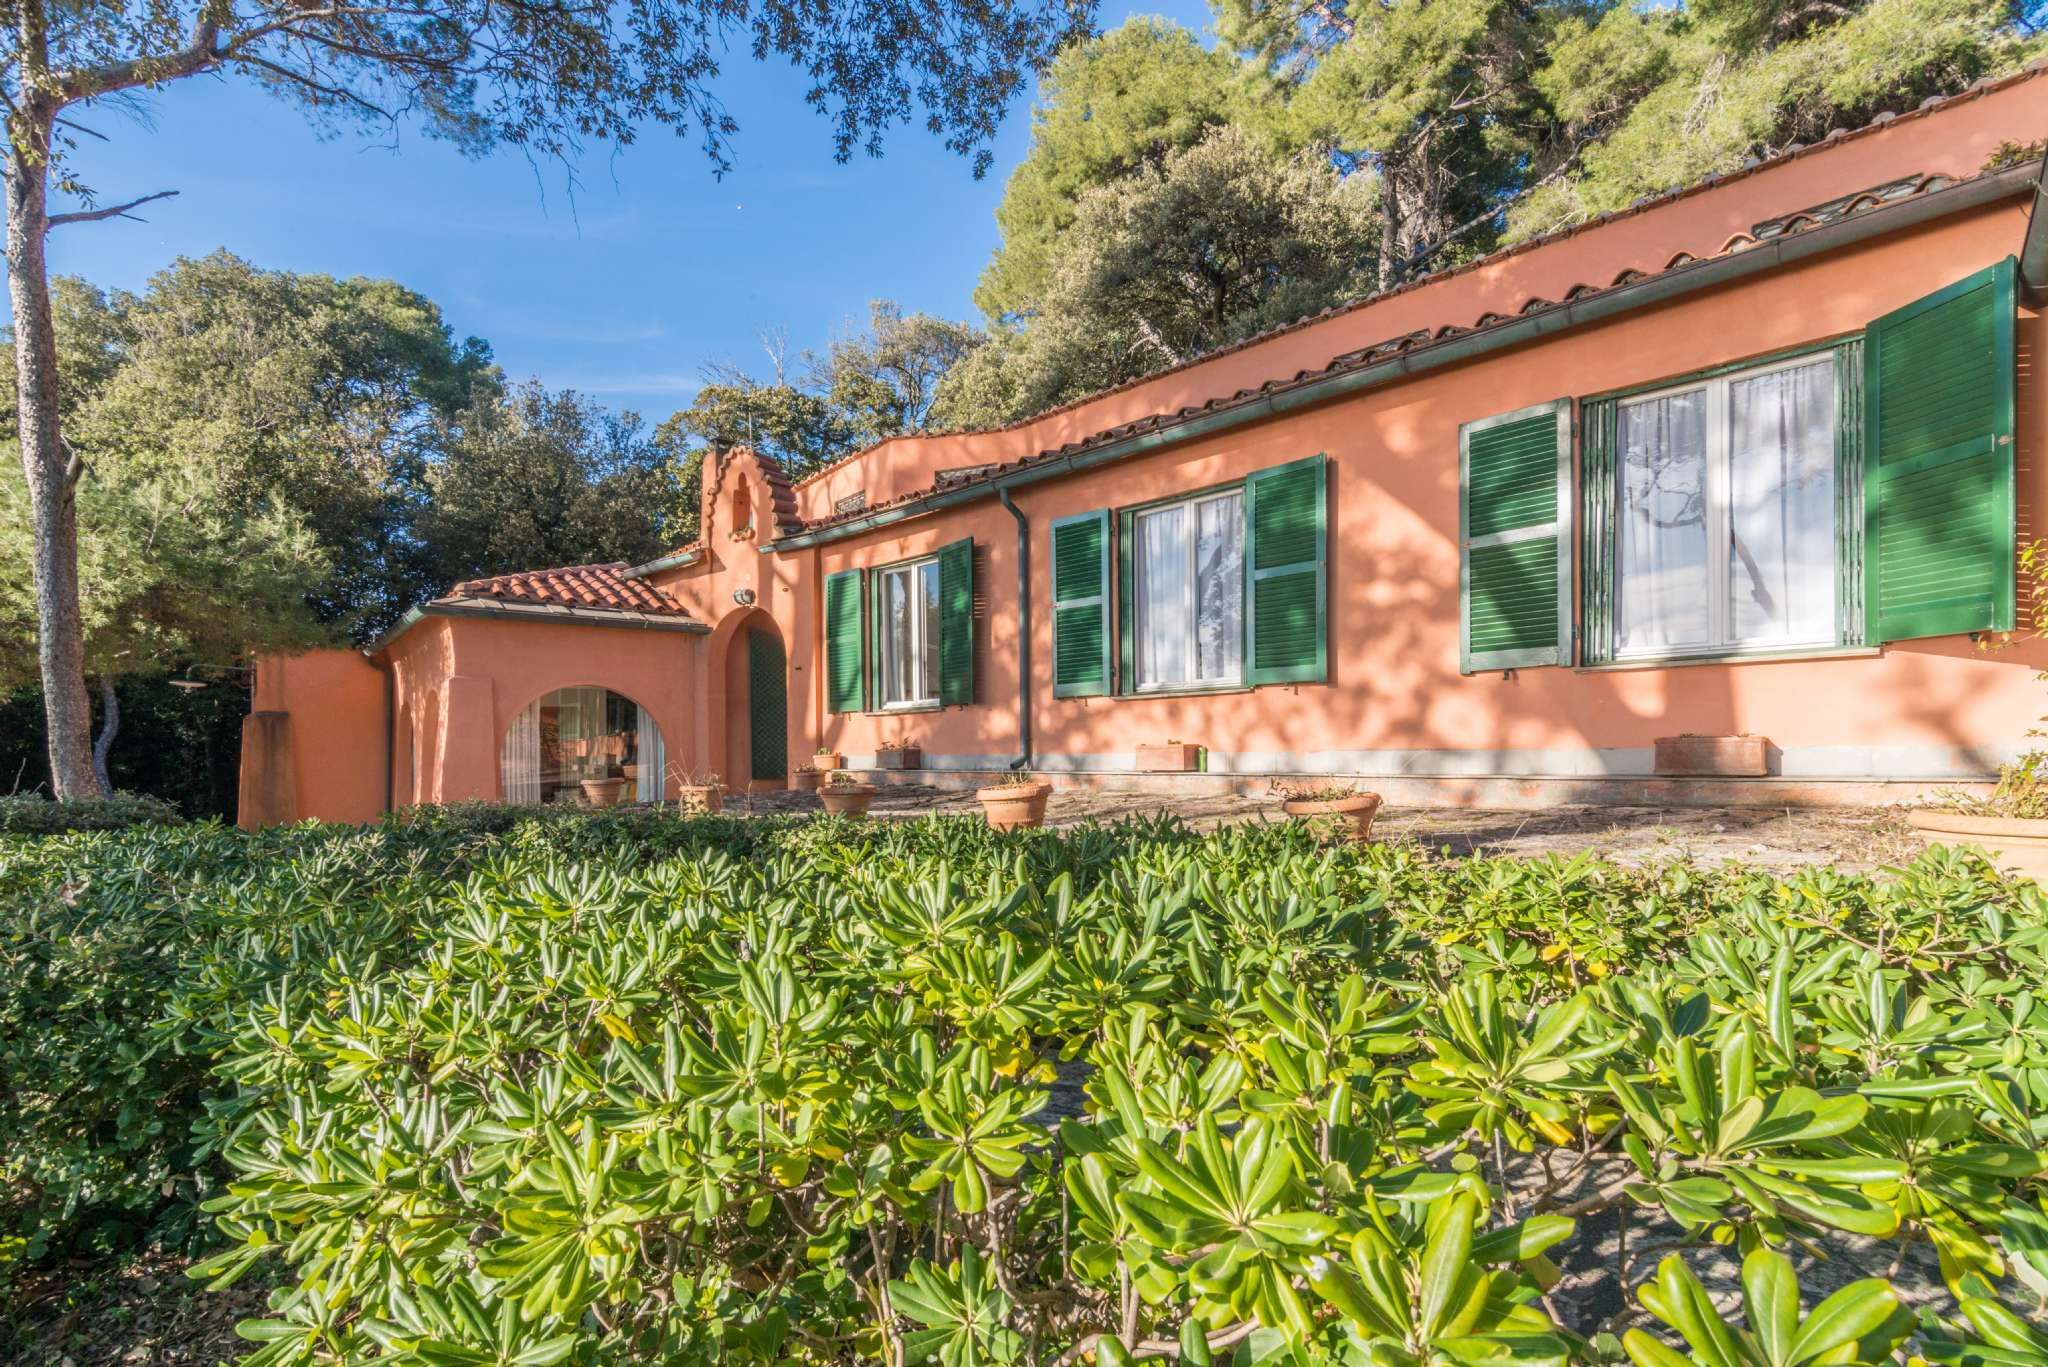 Villa in Vendita a Lerici: 5 locali, 300 mq - Foto 6